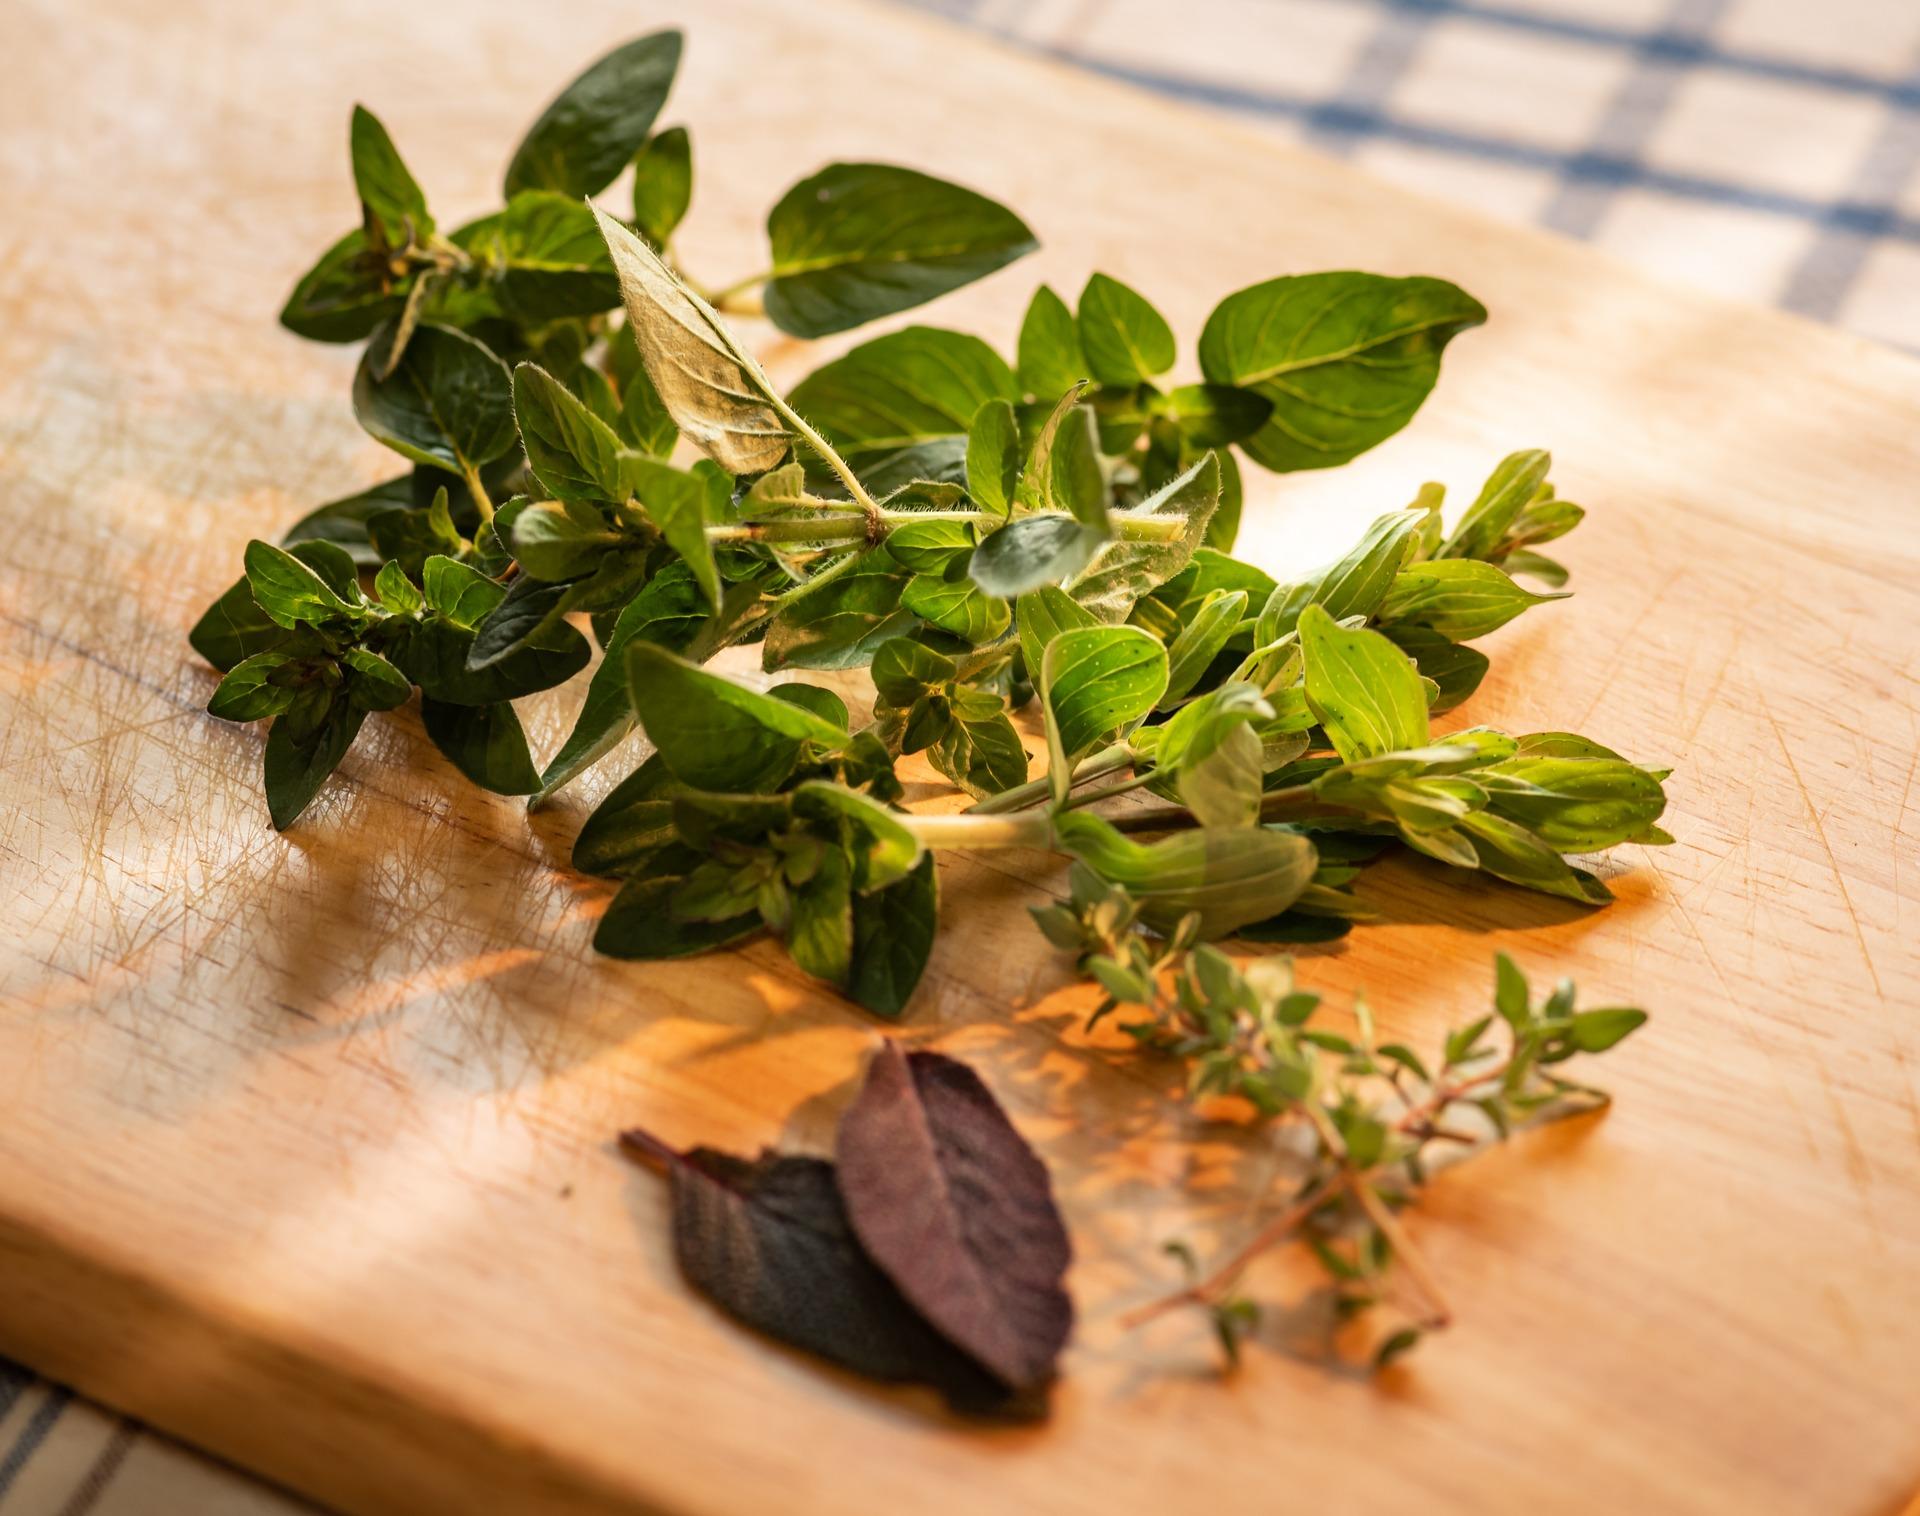 culinary-herbs-4198241_1920